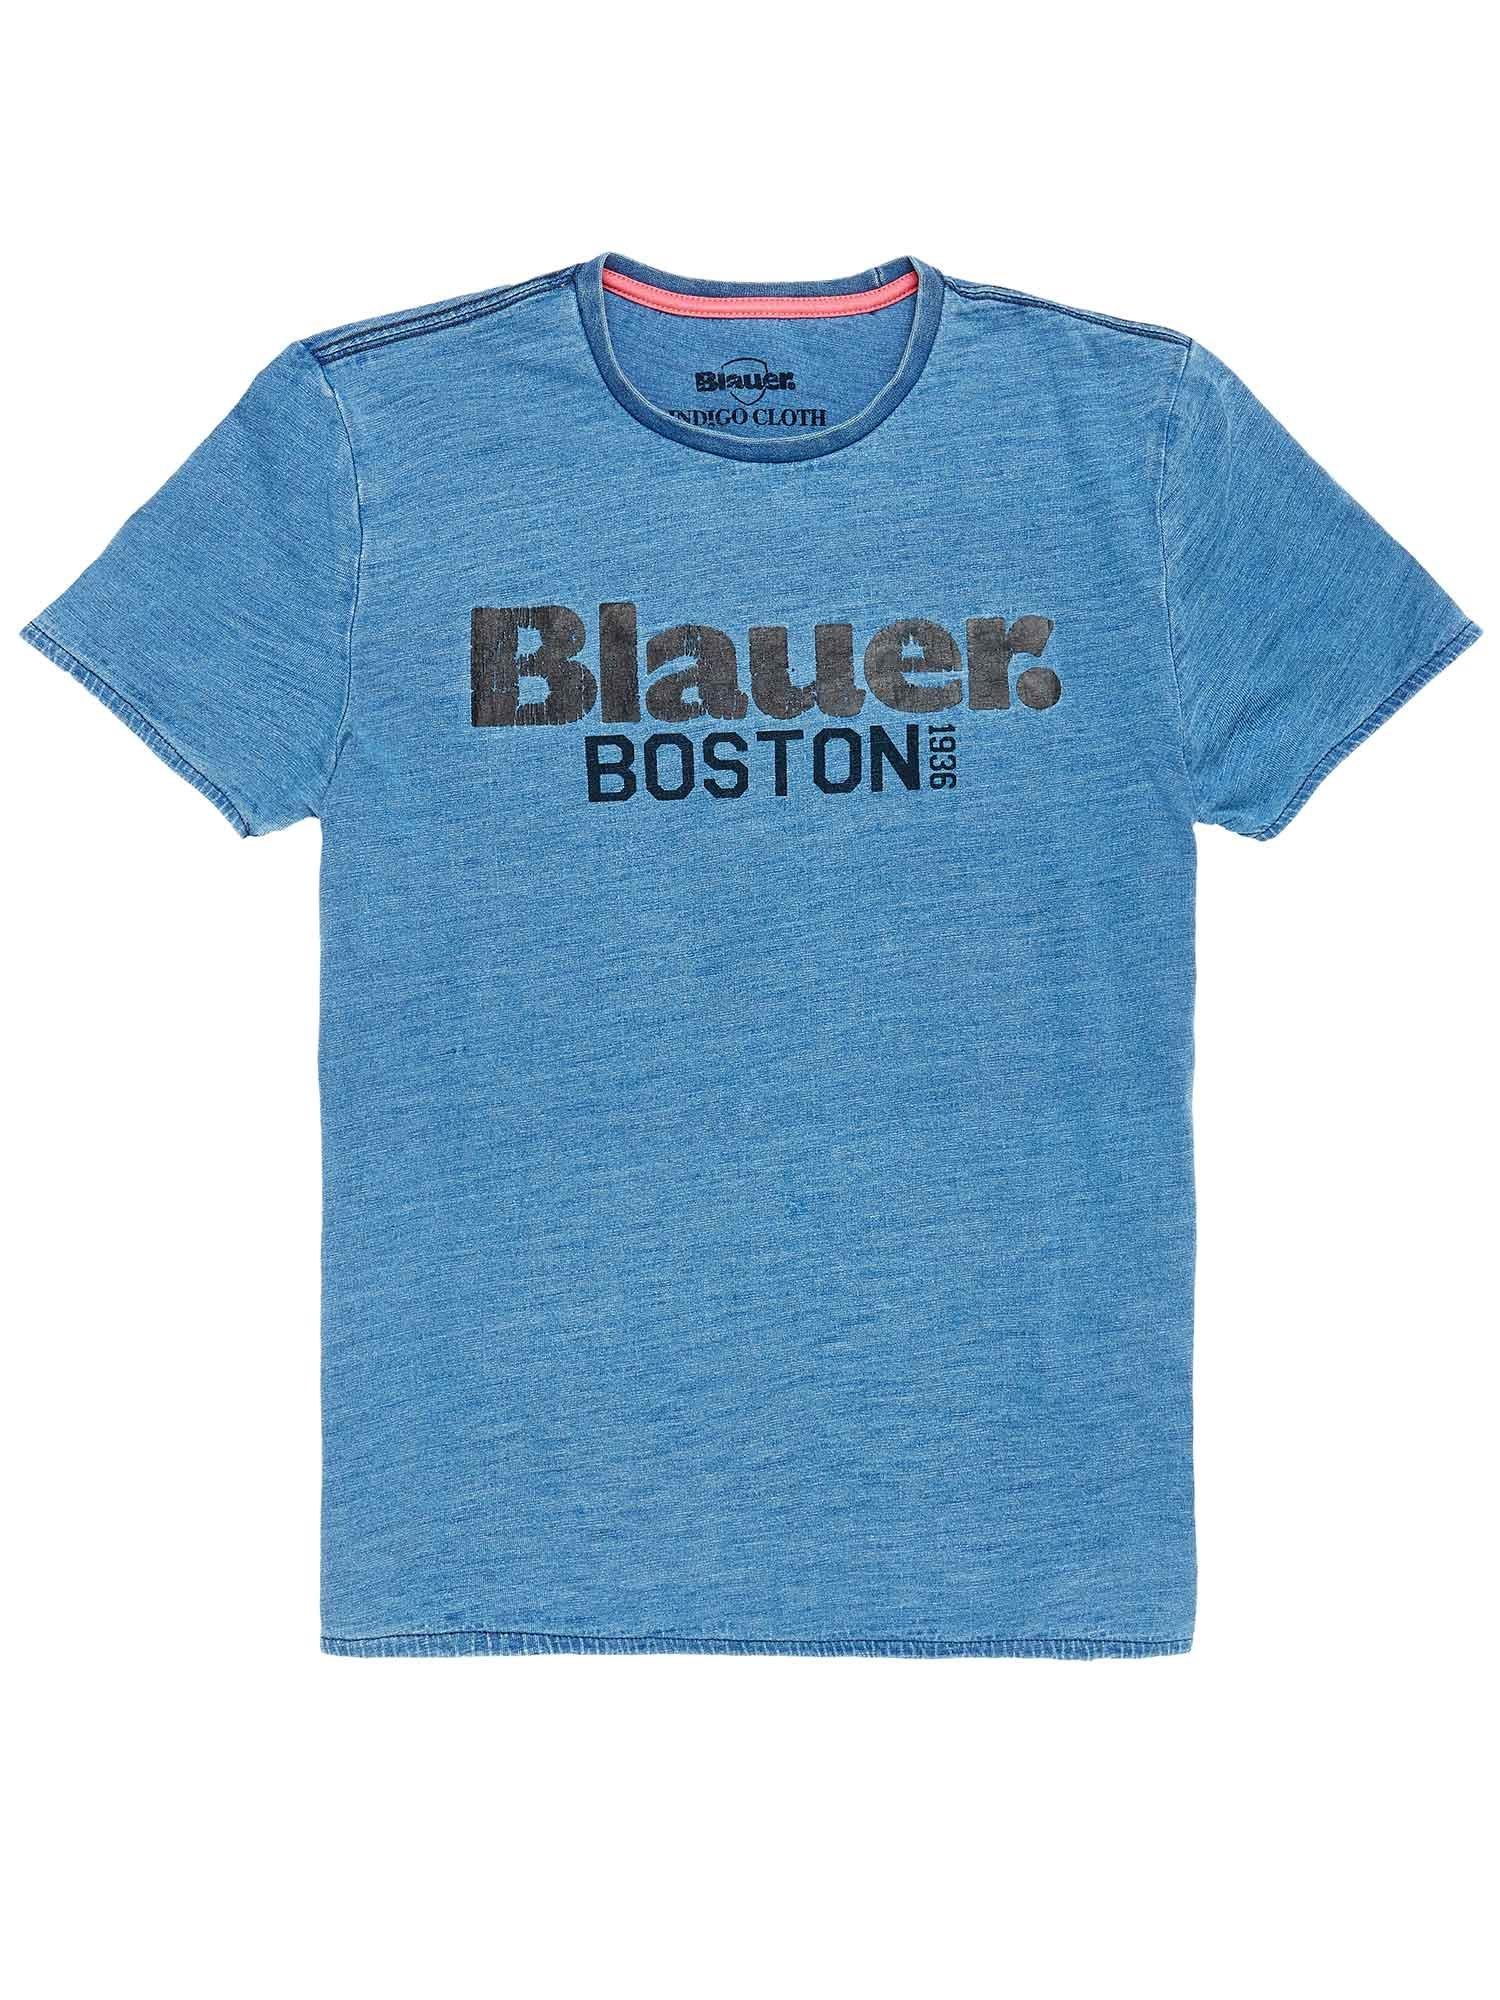 T-SHIRT JERSEY BLAUER BOSTON 1936 - Blue Thames - Blauer